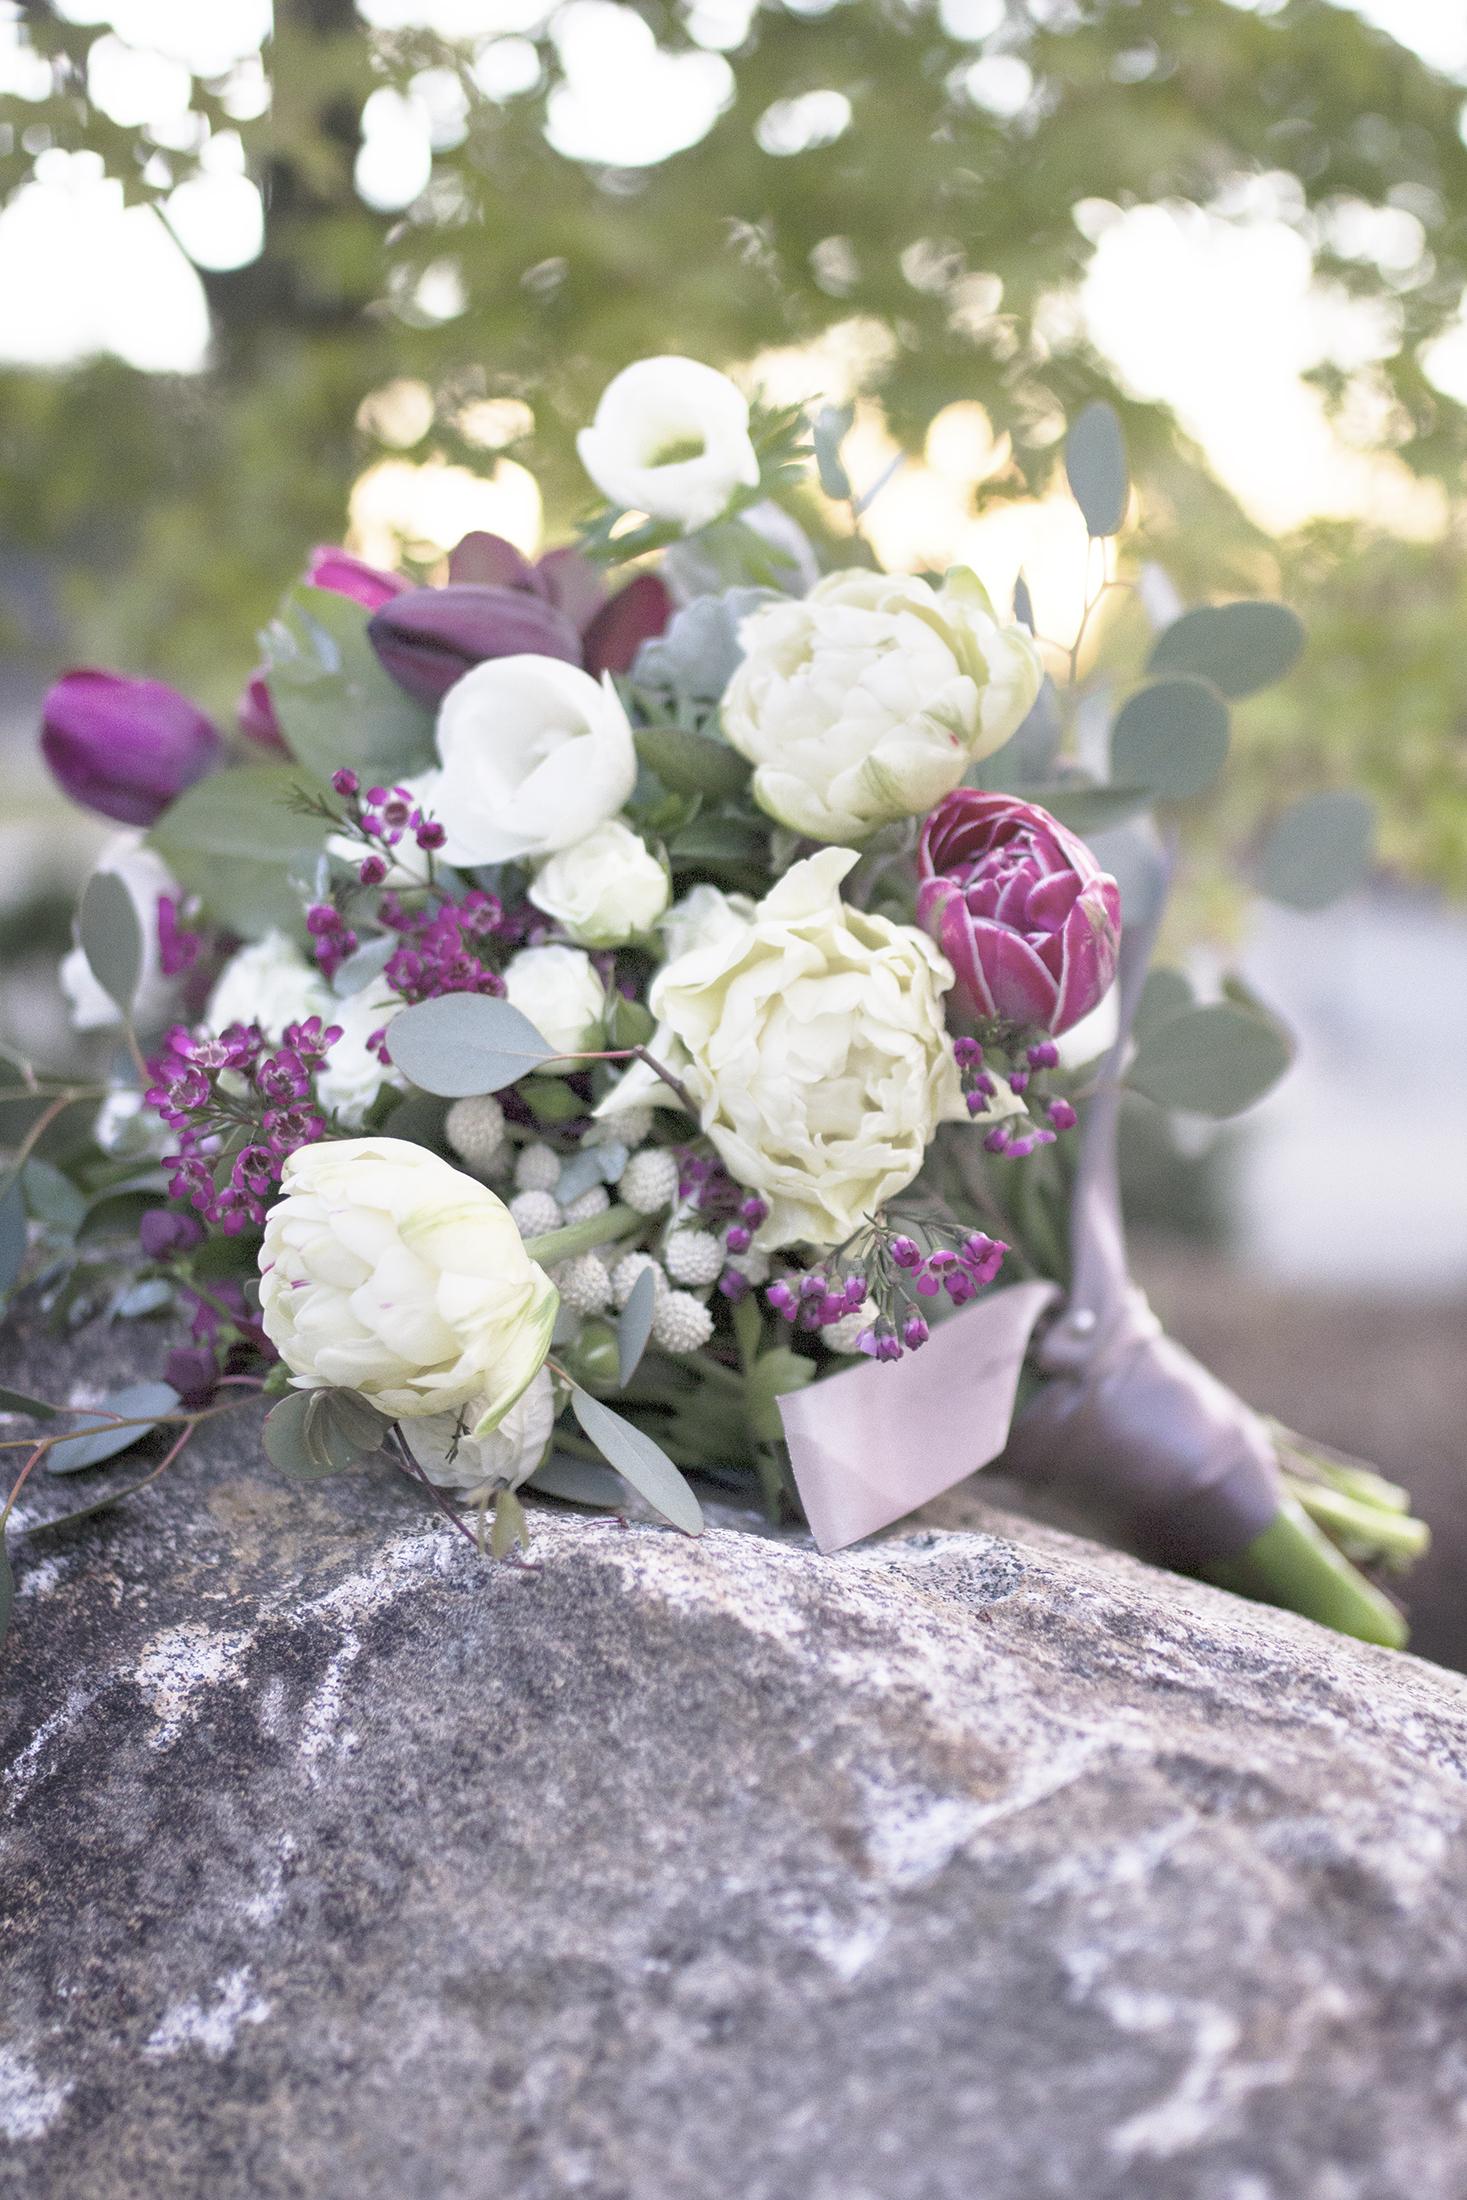 reduced_ss_bridal_bouquet_tulips_purple_white_euc_dusty_sunset.jpg